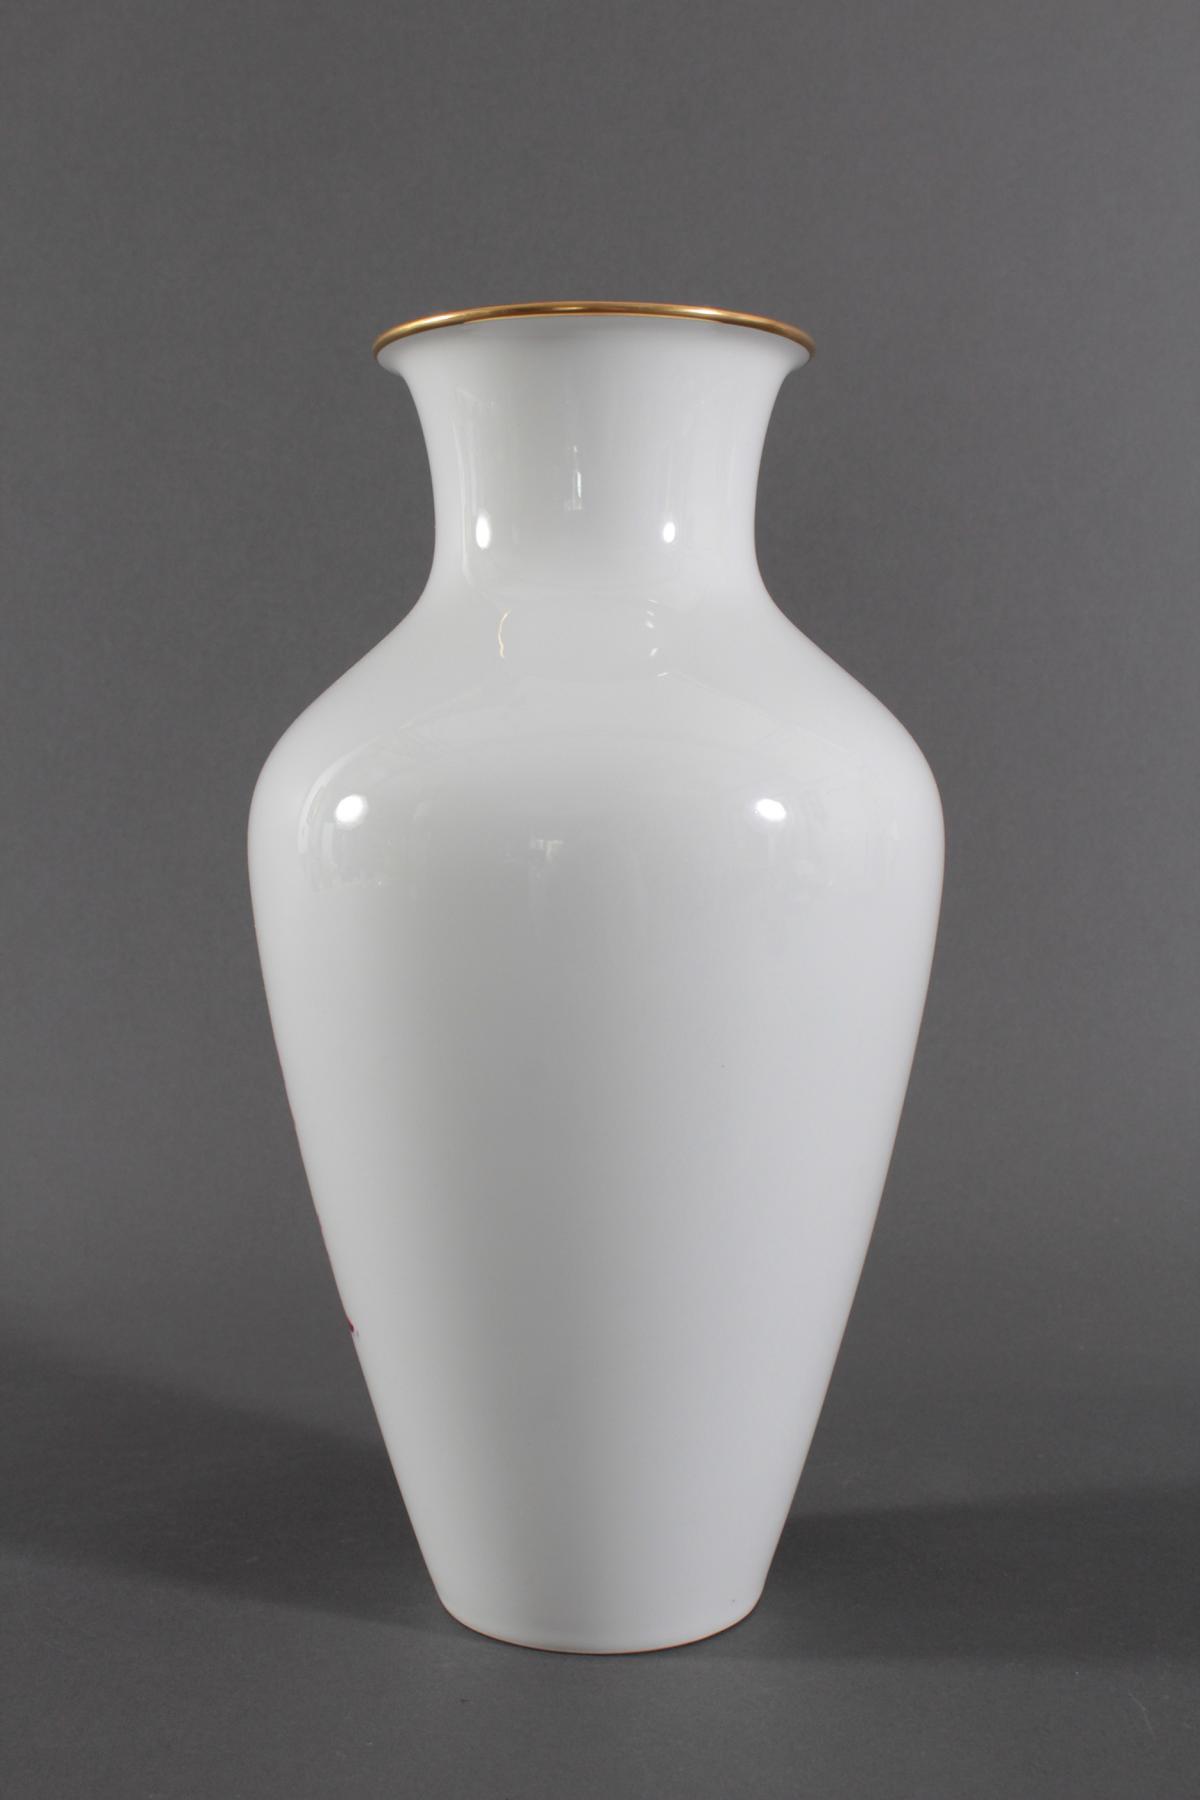 Große Vase, Höchster Porzellanmanufaktur, Malersignatur Kurt Schröder-3